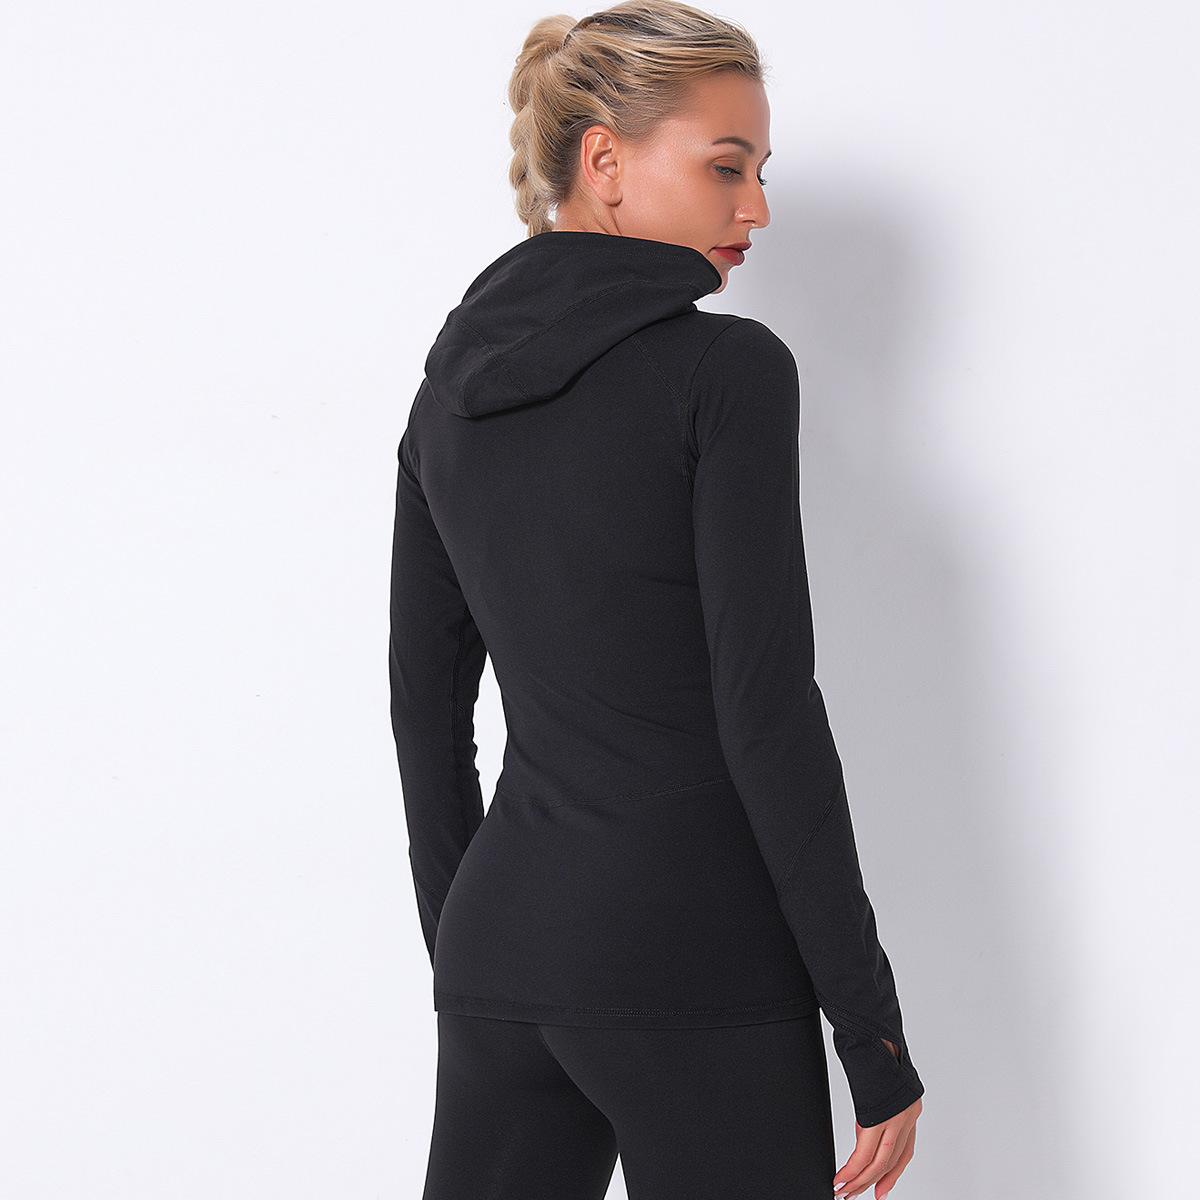 quick-drying front zipper hooded long sleeves sports shirt NSLX9046